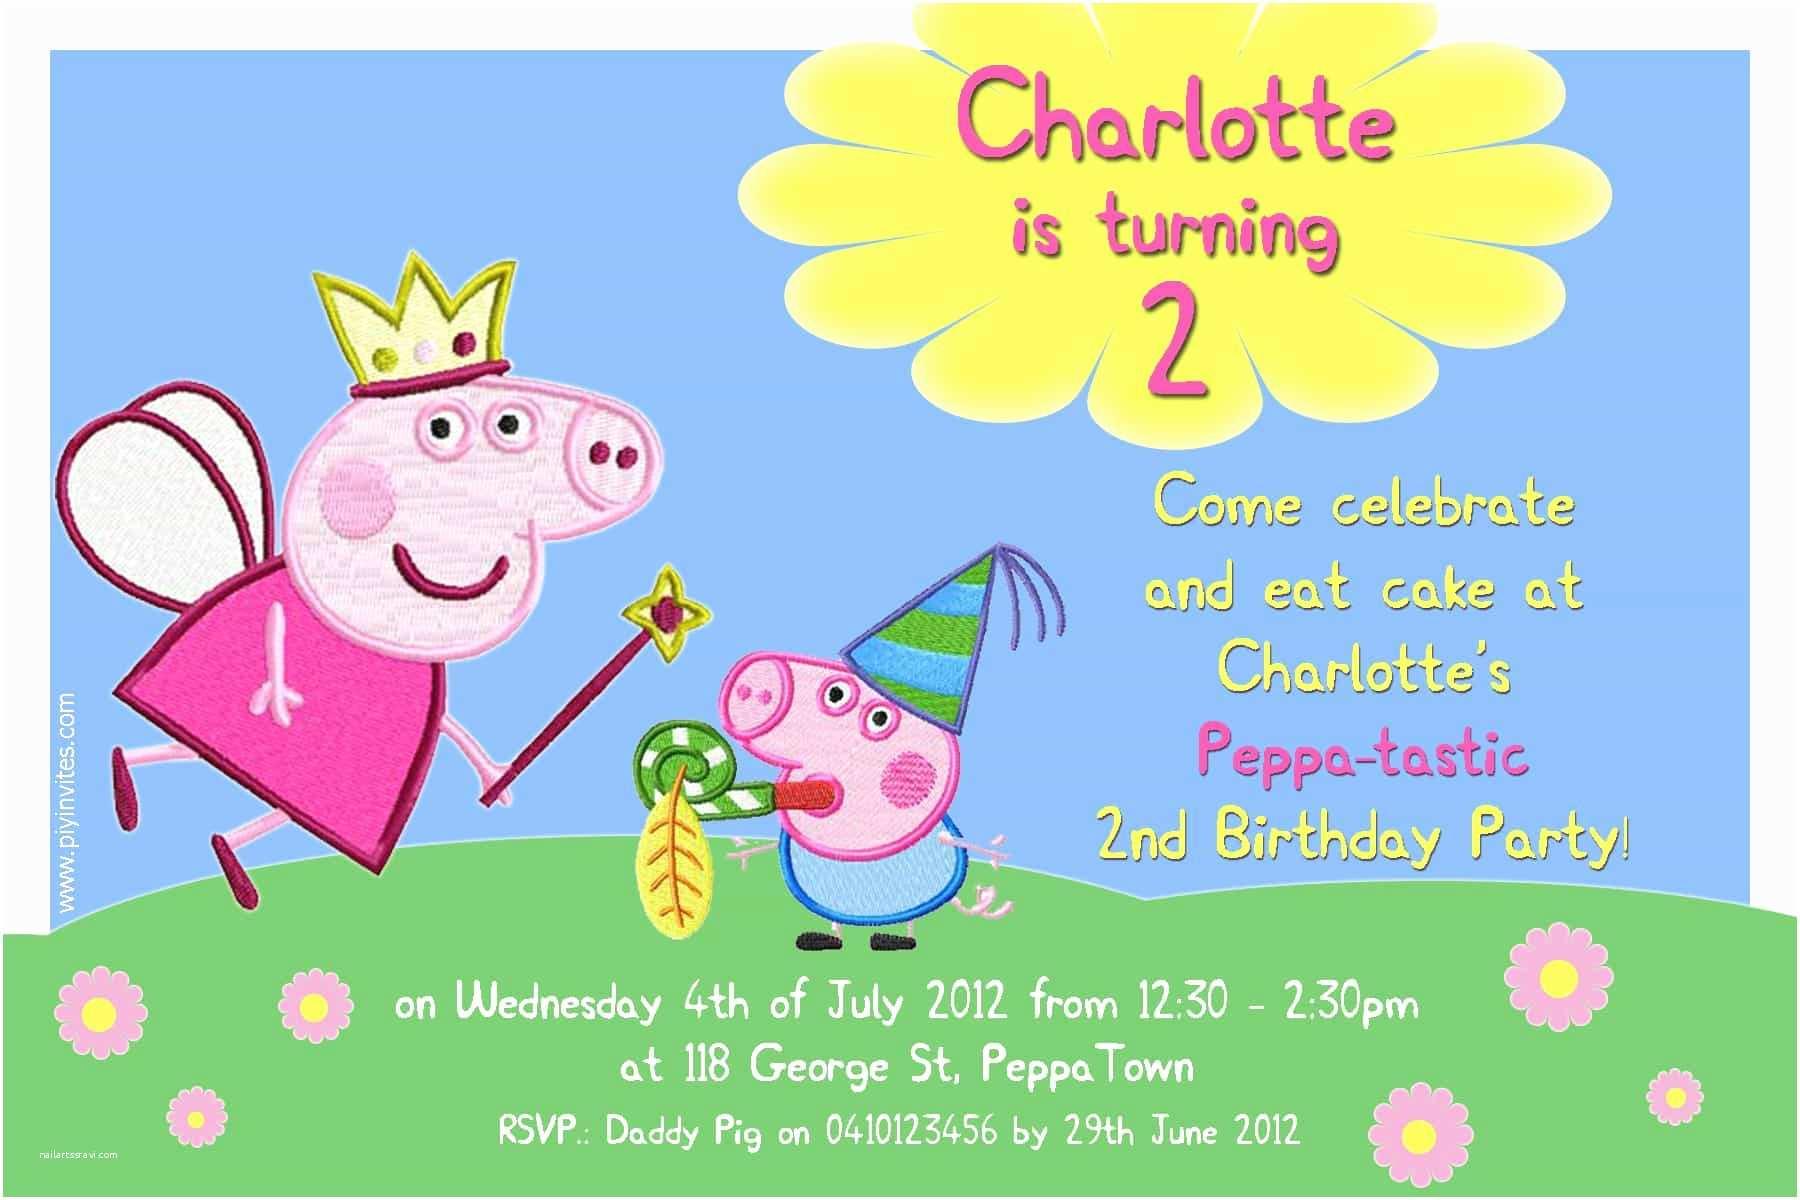 Peppa Pig Birthday Invitations I Make I Peppa Pig Invitation ... concernant Peppa Pig À La Piscine